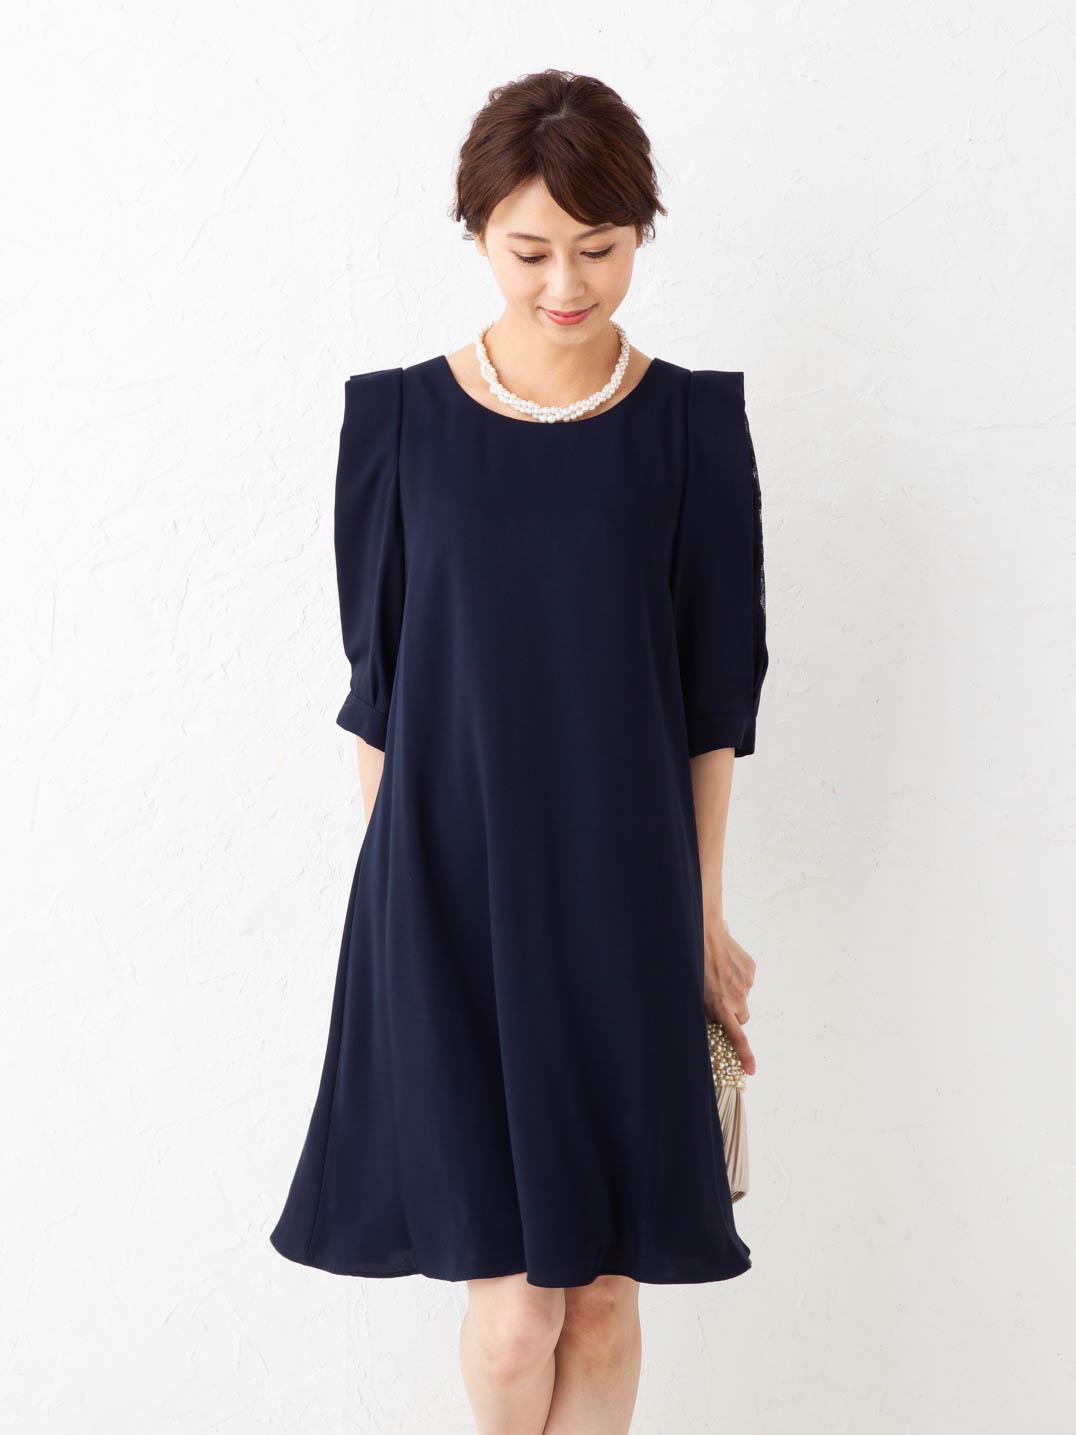 RYK ドレス / Mサイズ (DOC0097)